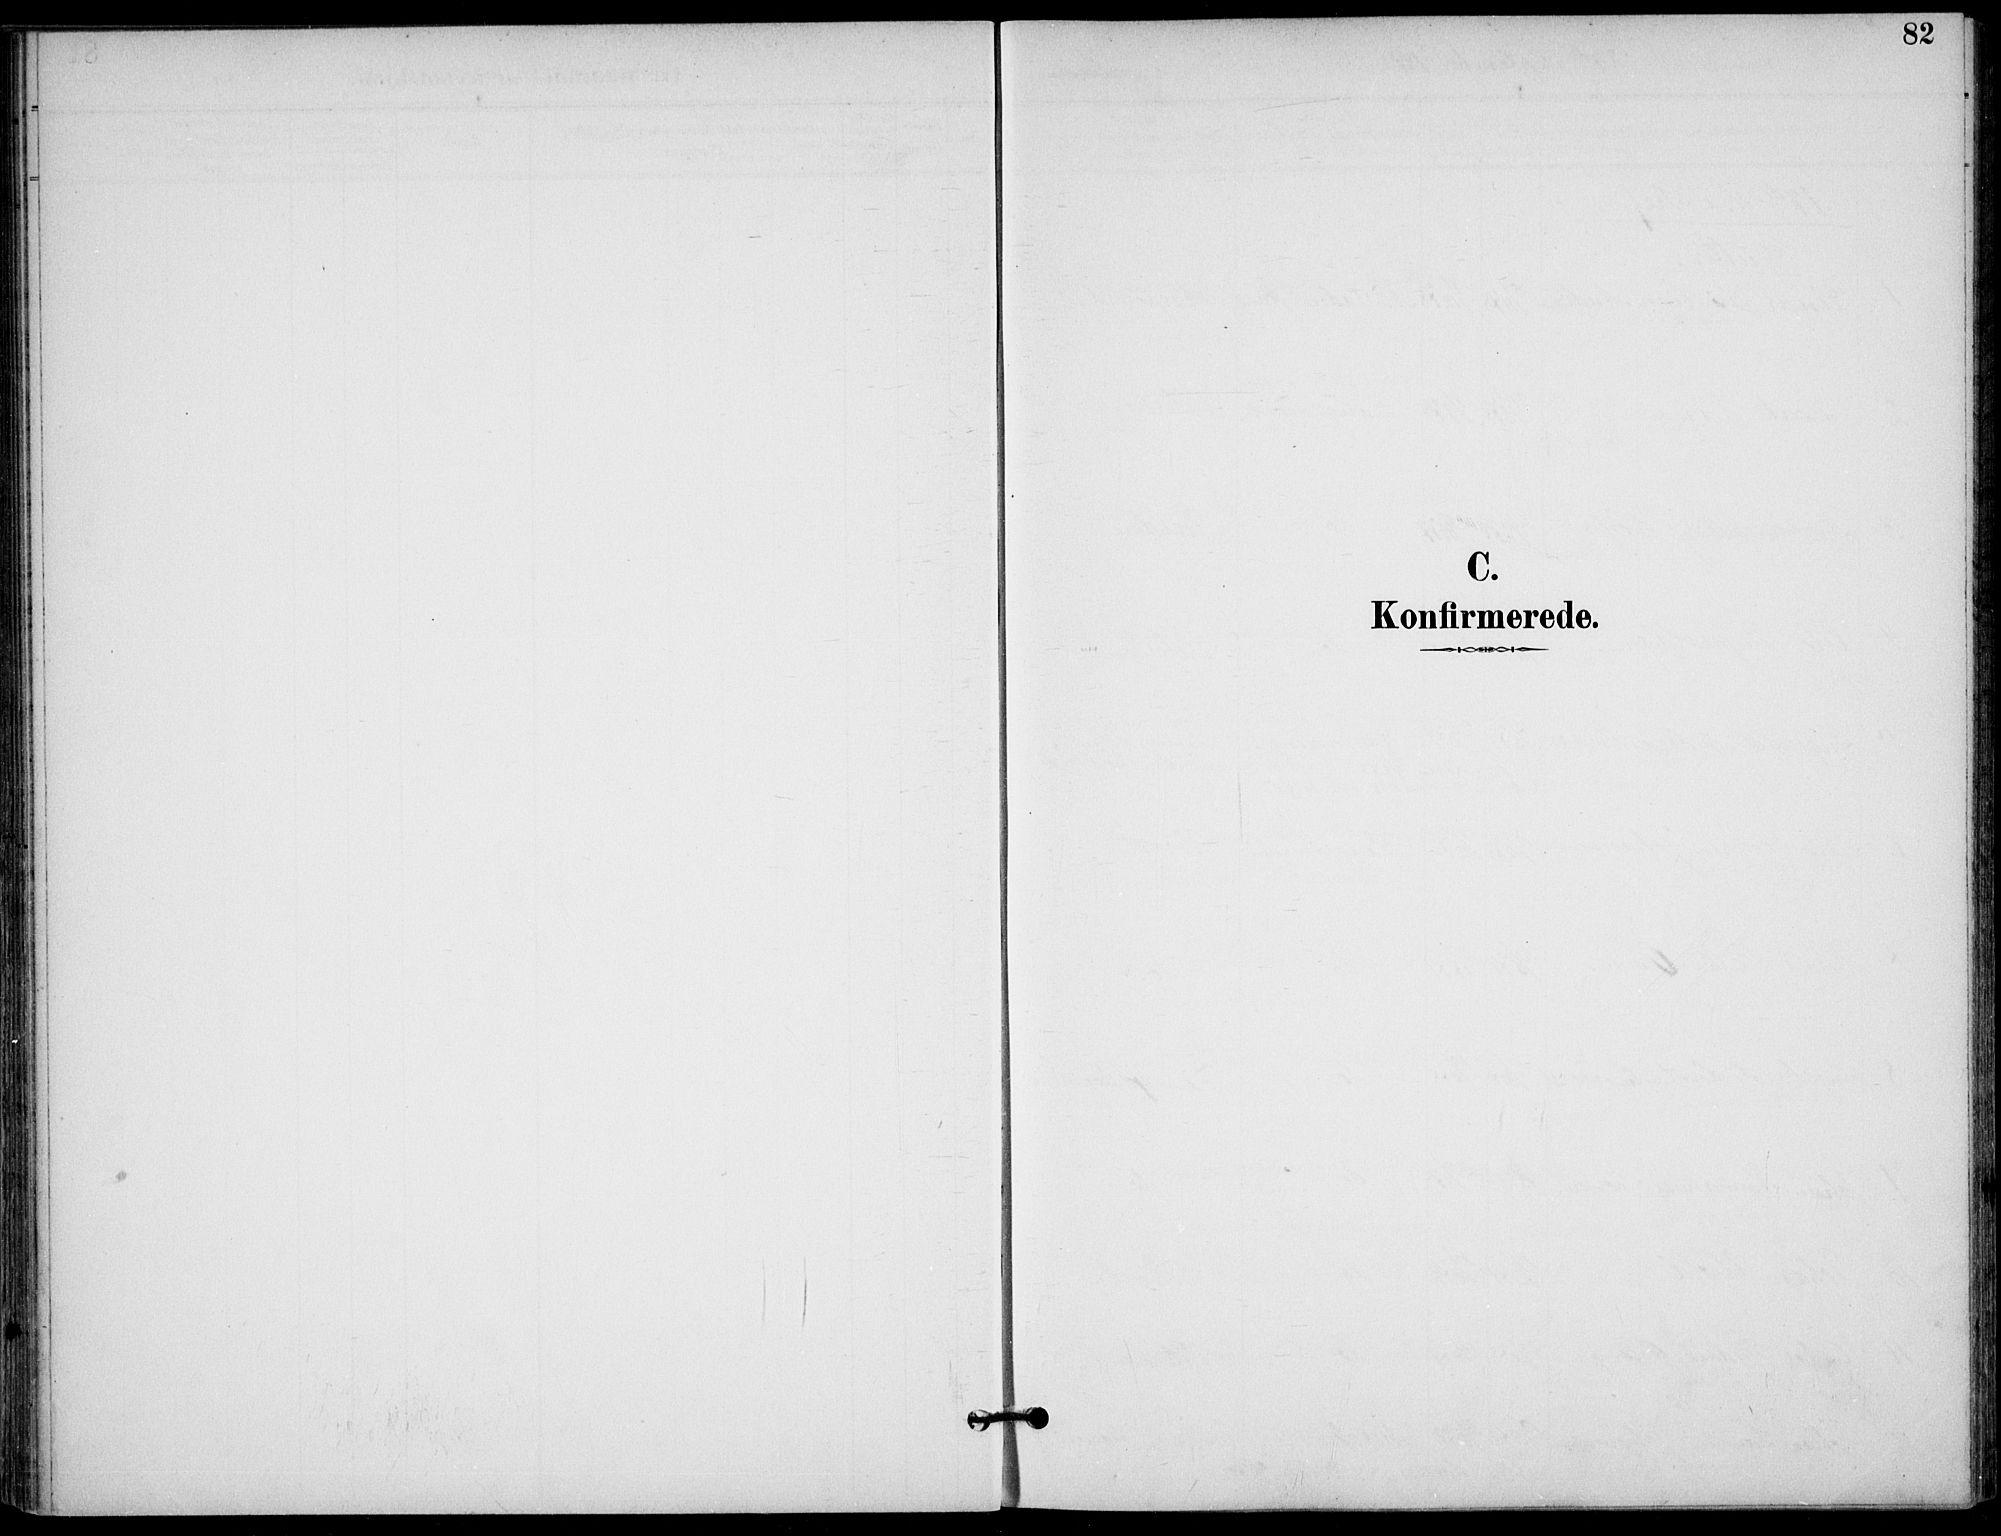 SAKO, Langesund kirkebøker, F/Fa/L0003: Ministerialbok nr. 3, 1893-1907, s. 82